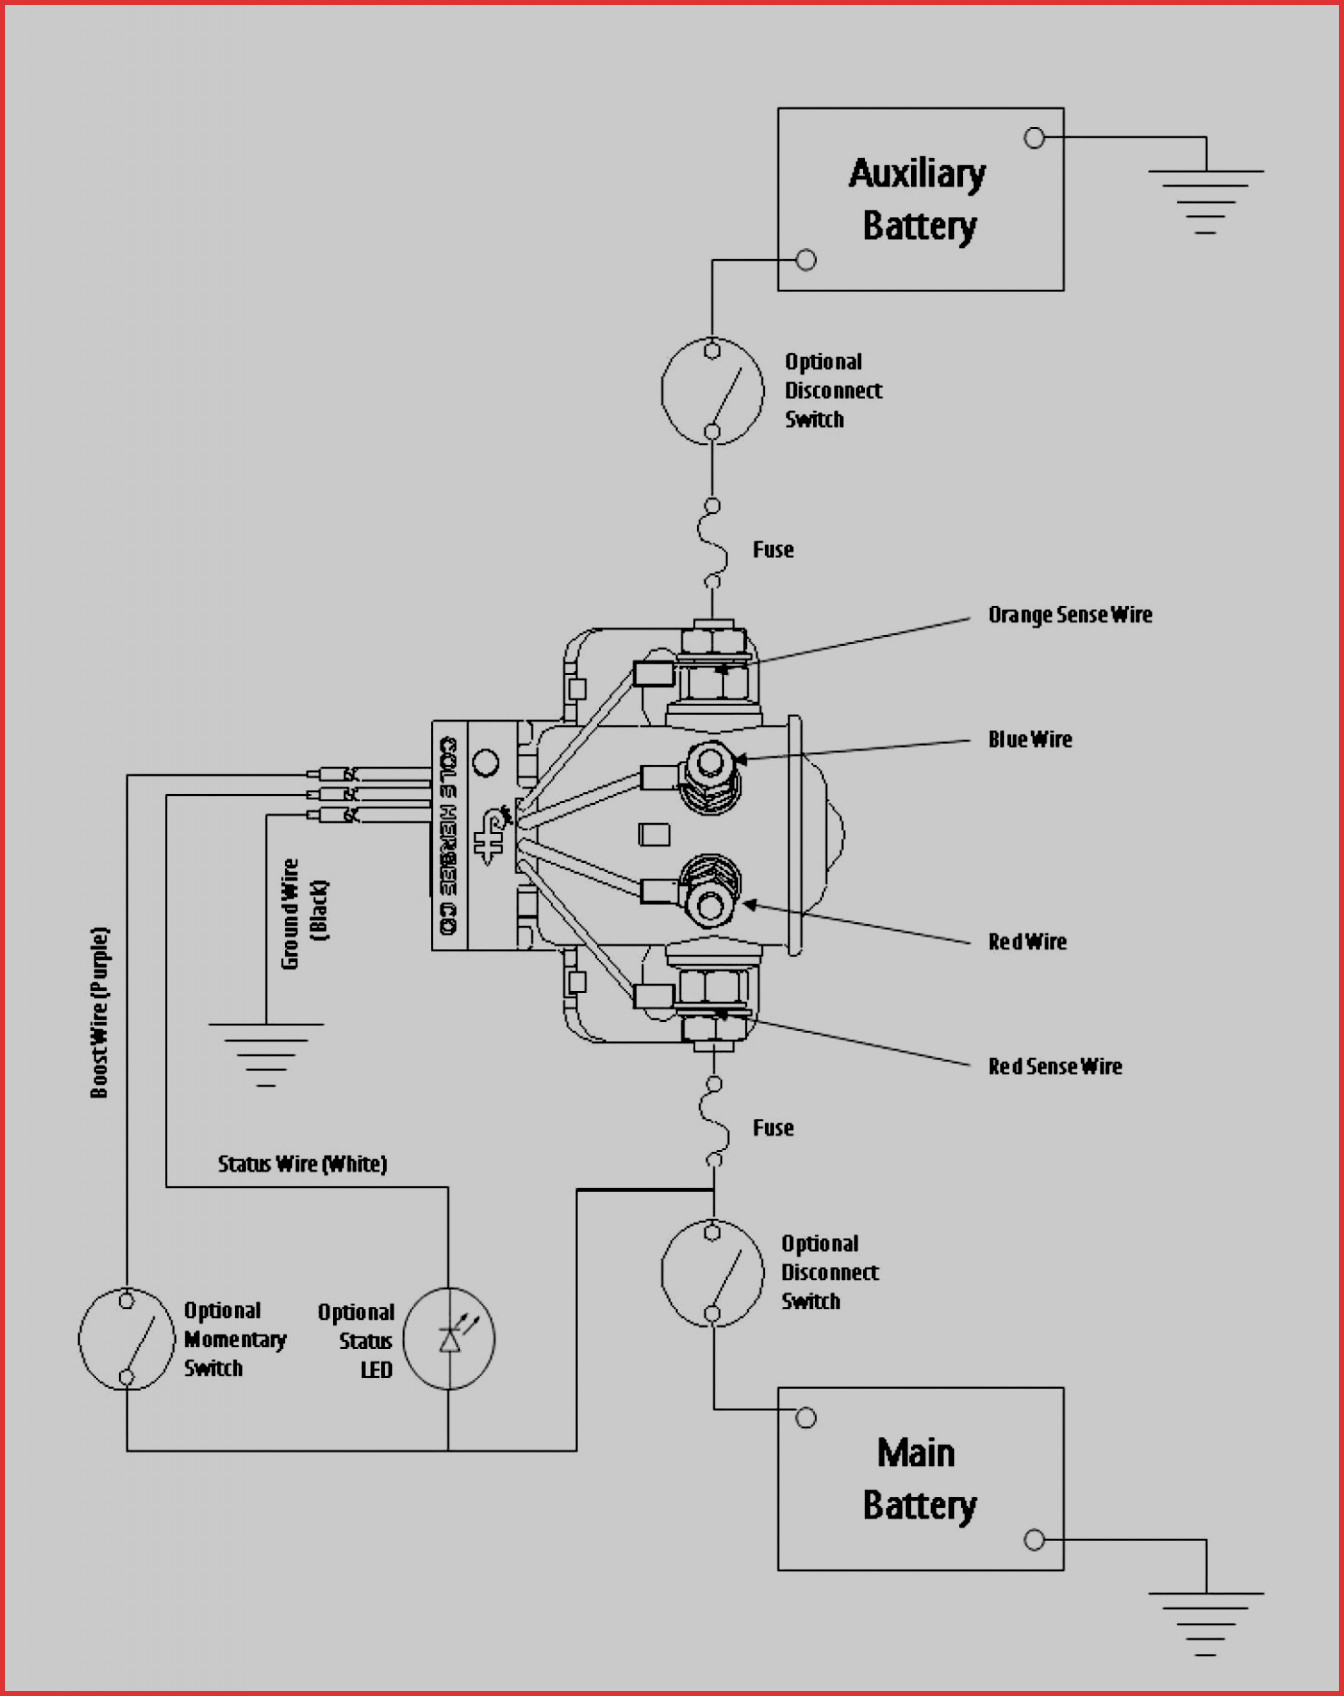 Honeywell He 300 Wiring Diagram | Wiring Diagram - Honeywell Zone Valve Wiring Diagram